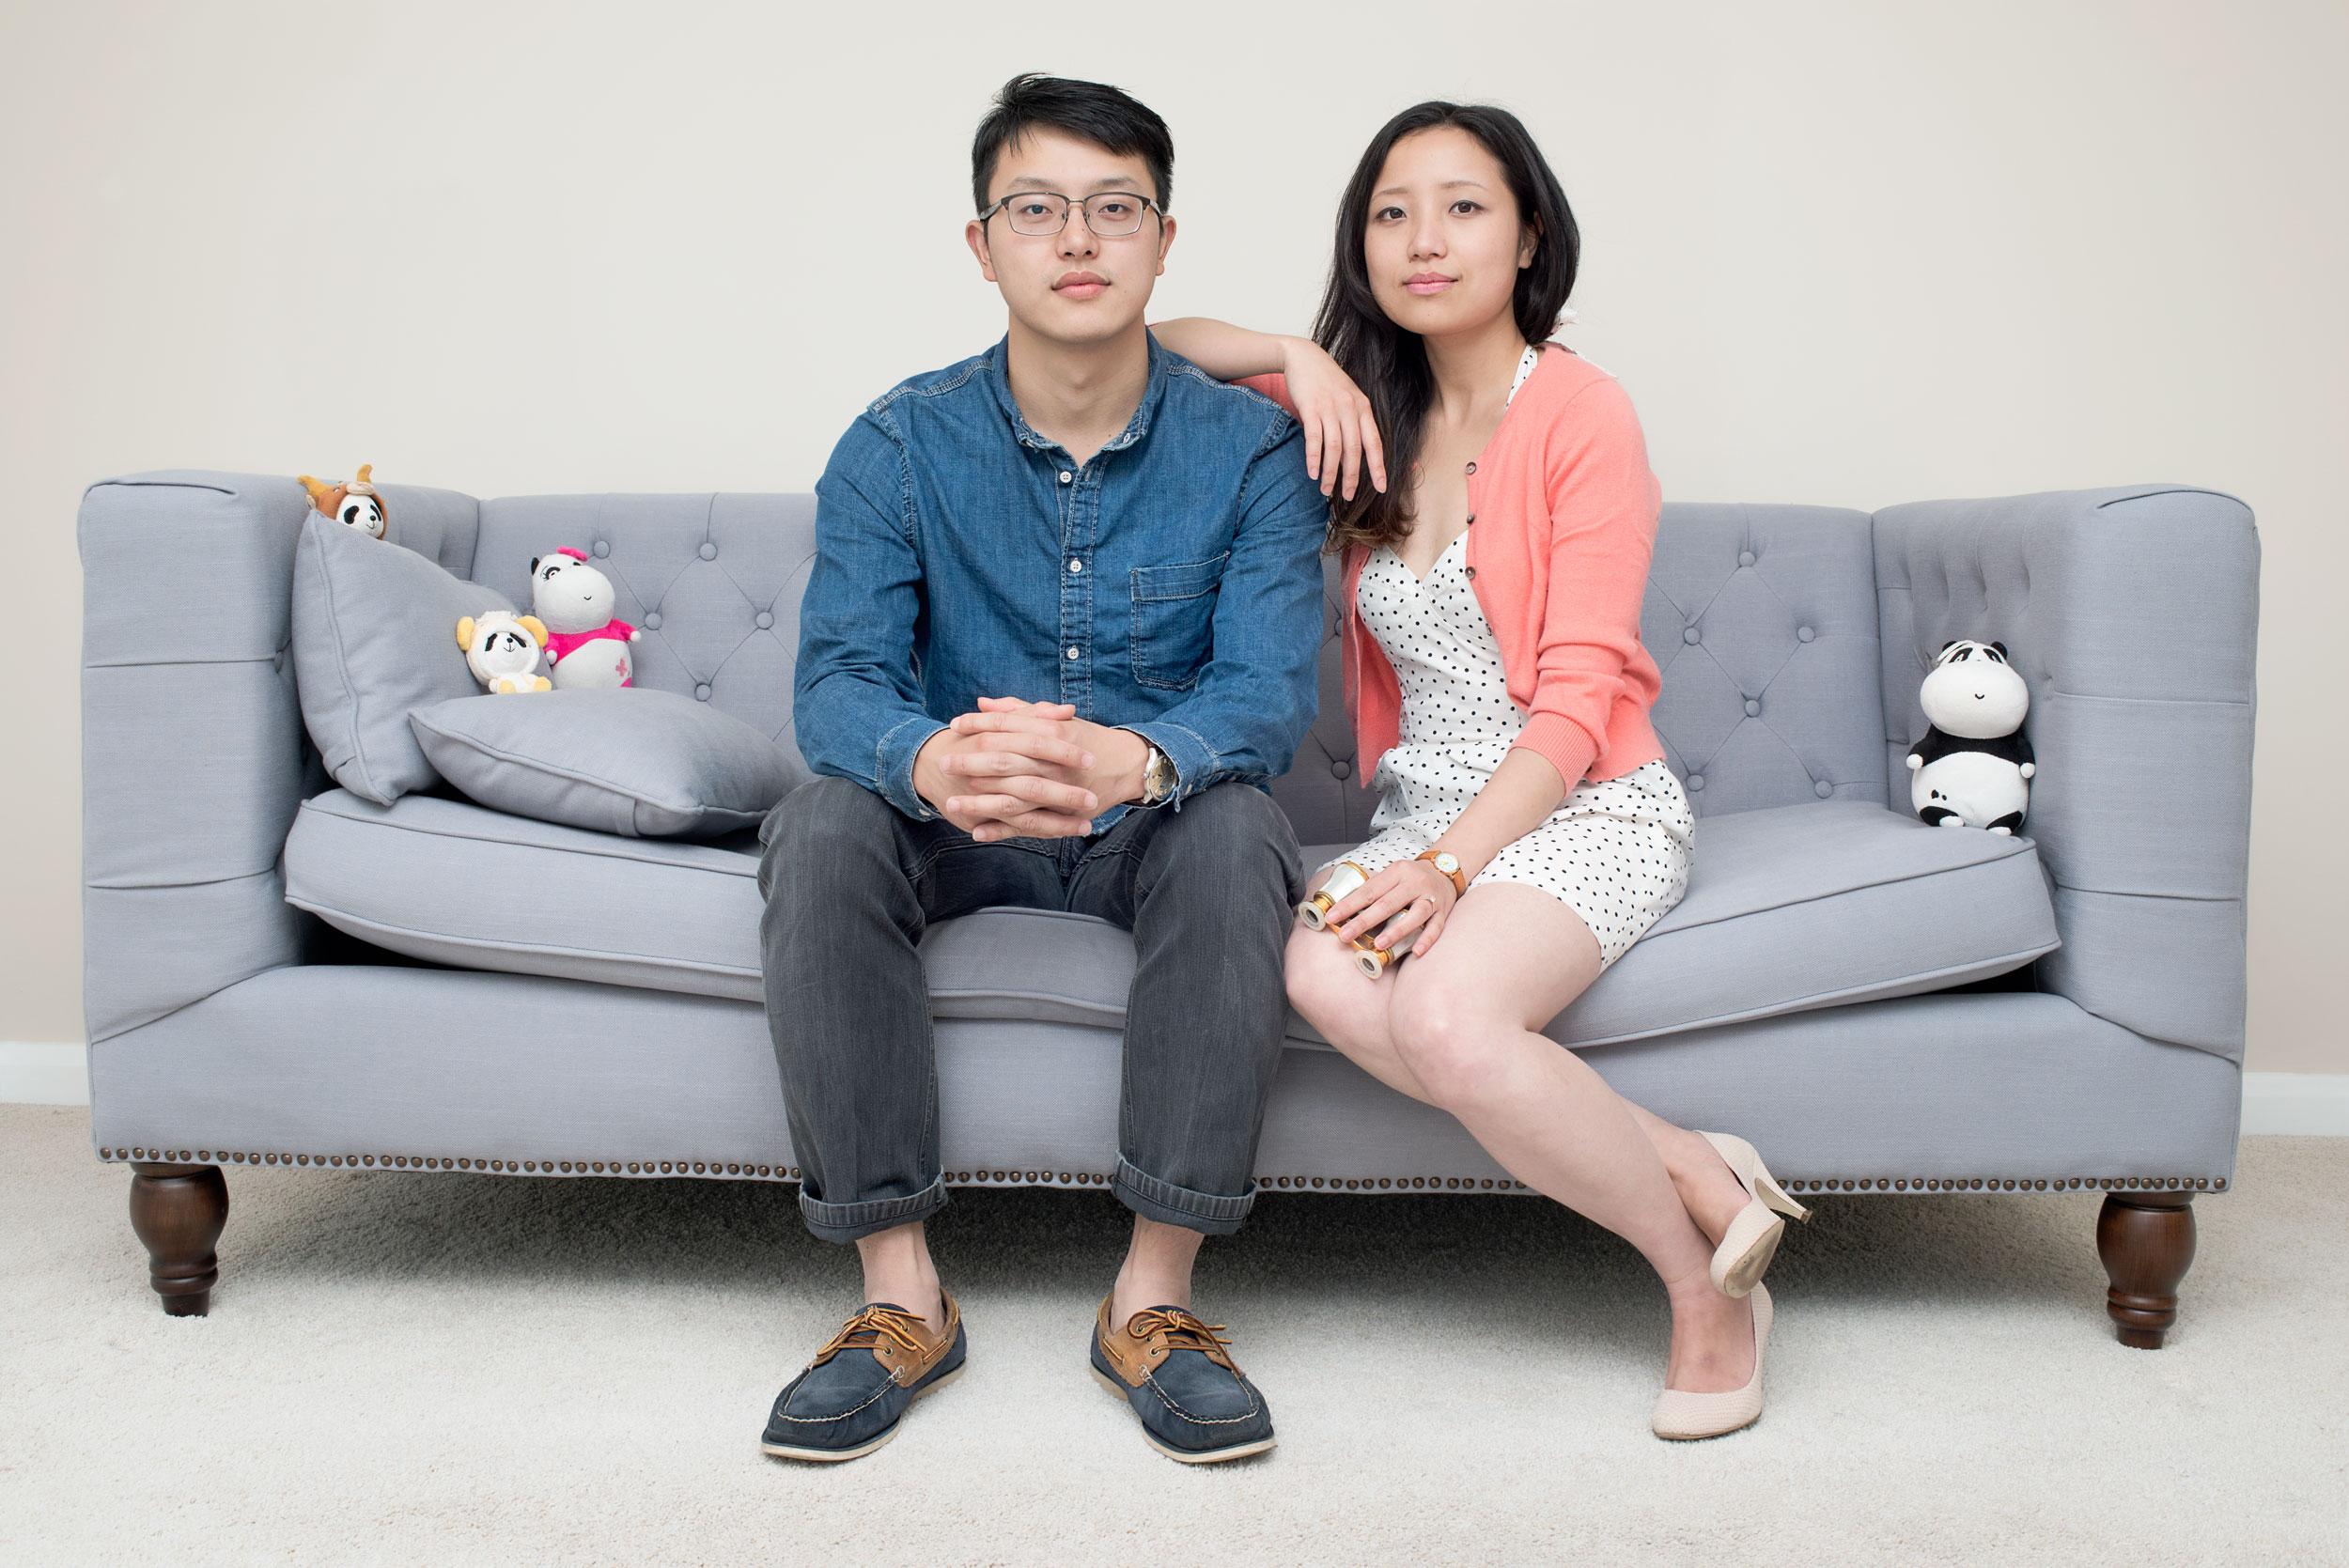 Maolin Liao and Lin Sun